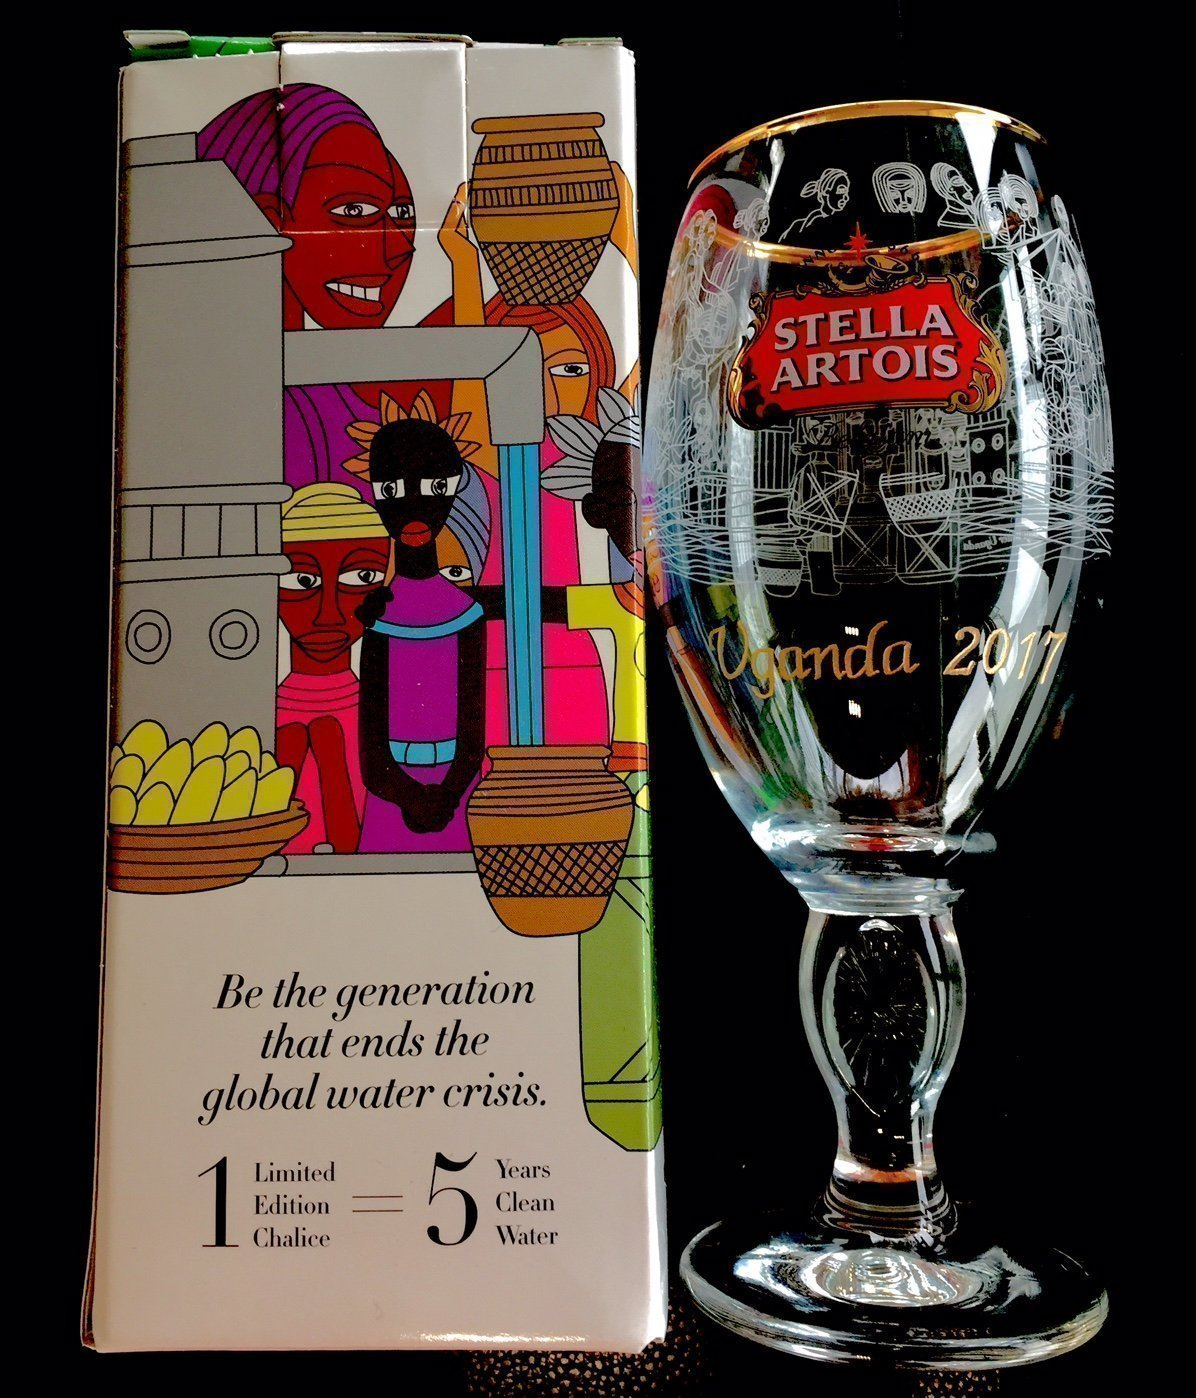 Stella Artois Chalice Engraving, STELLA CHALICE 33Cl, Stella Artois Buy a Lady a Drink, Cambodia, Uganda and Brazil Chalice, Stella Chalice Engraved, Buy a Lady a Drink, Engraved Glassware Gifts by Akoko Art Handengraved Crystal Glass (Image #3)